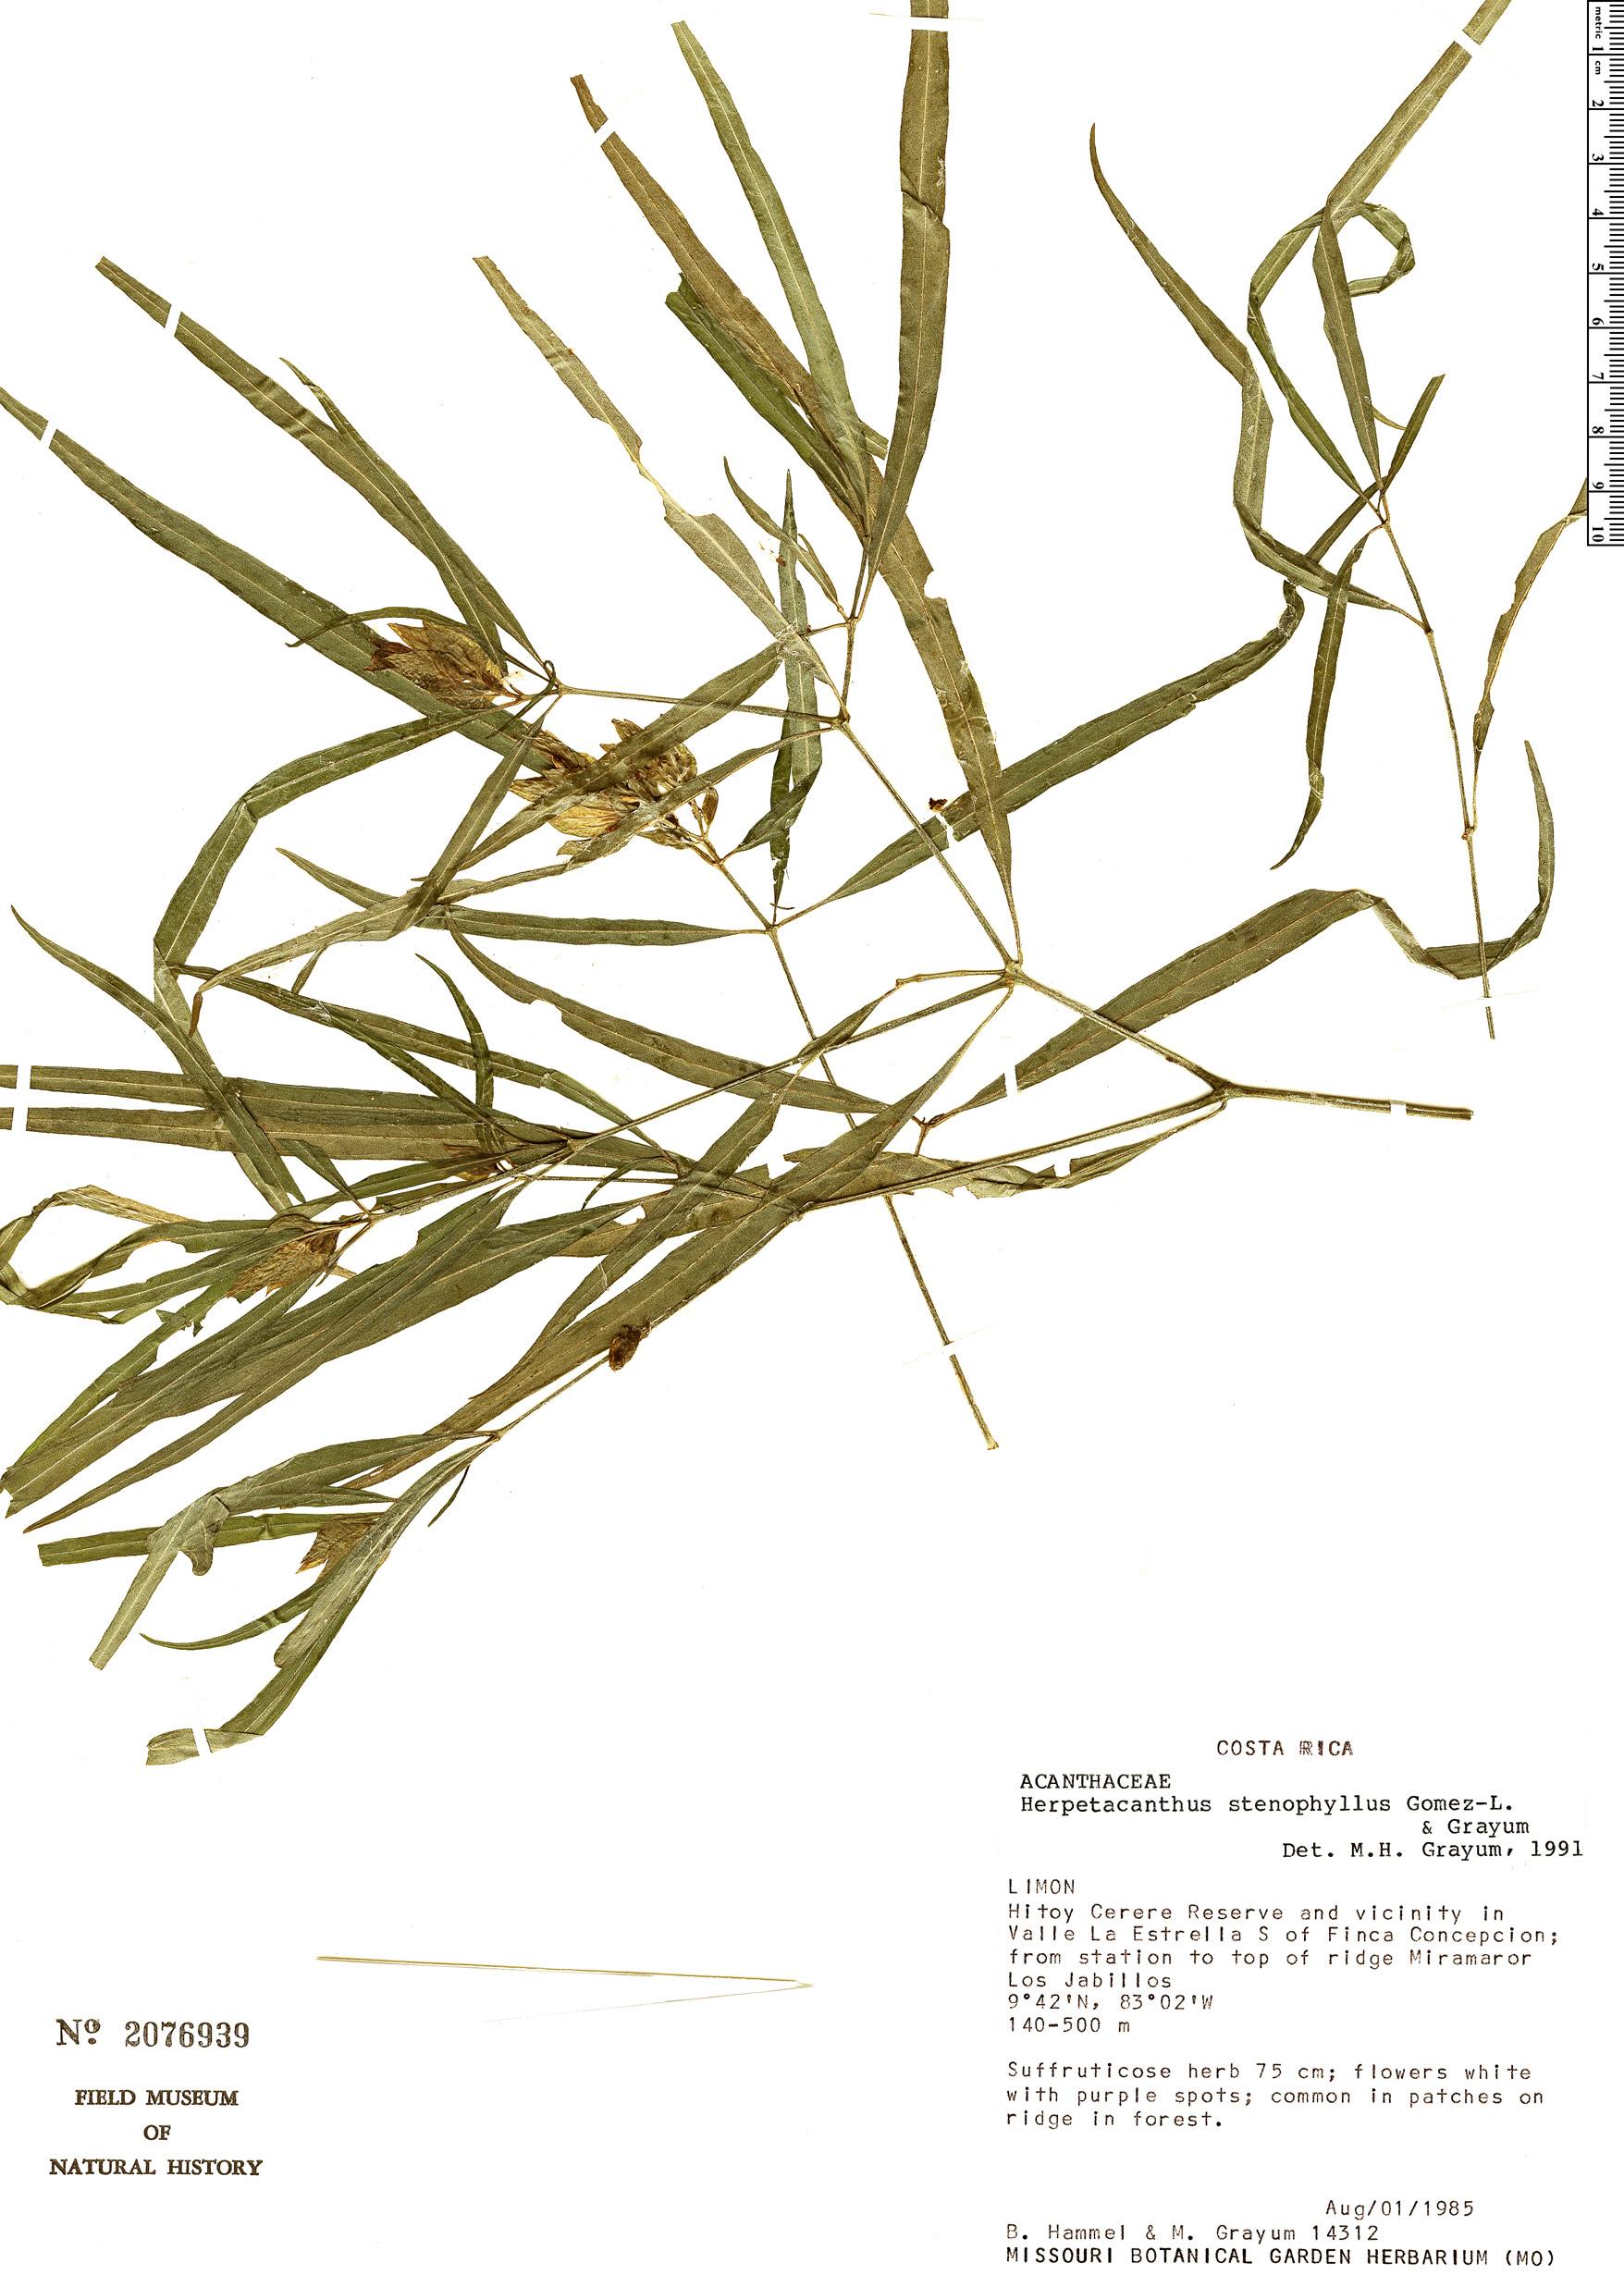 Specimen: Herpetacanthus stenophyllus